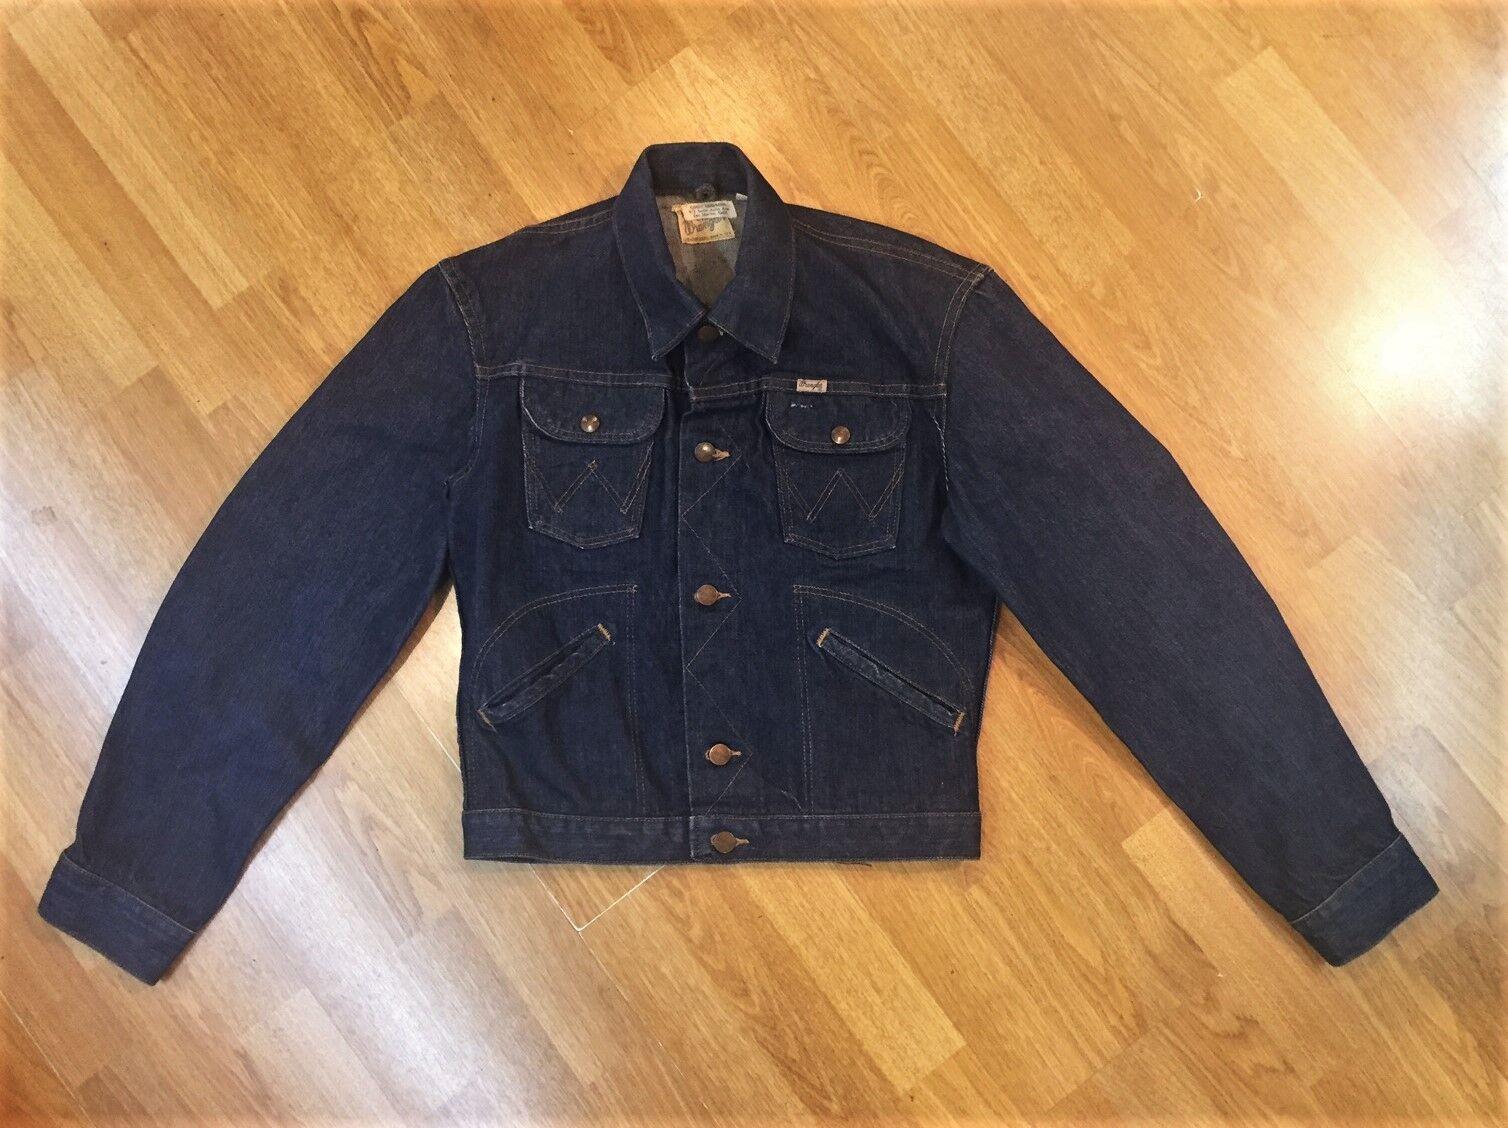 Rare Vintage Wrangler Denim Jacket - 50's/60's - … - image 6